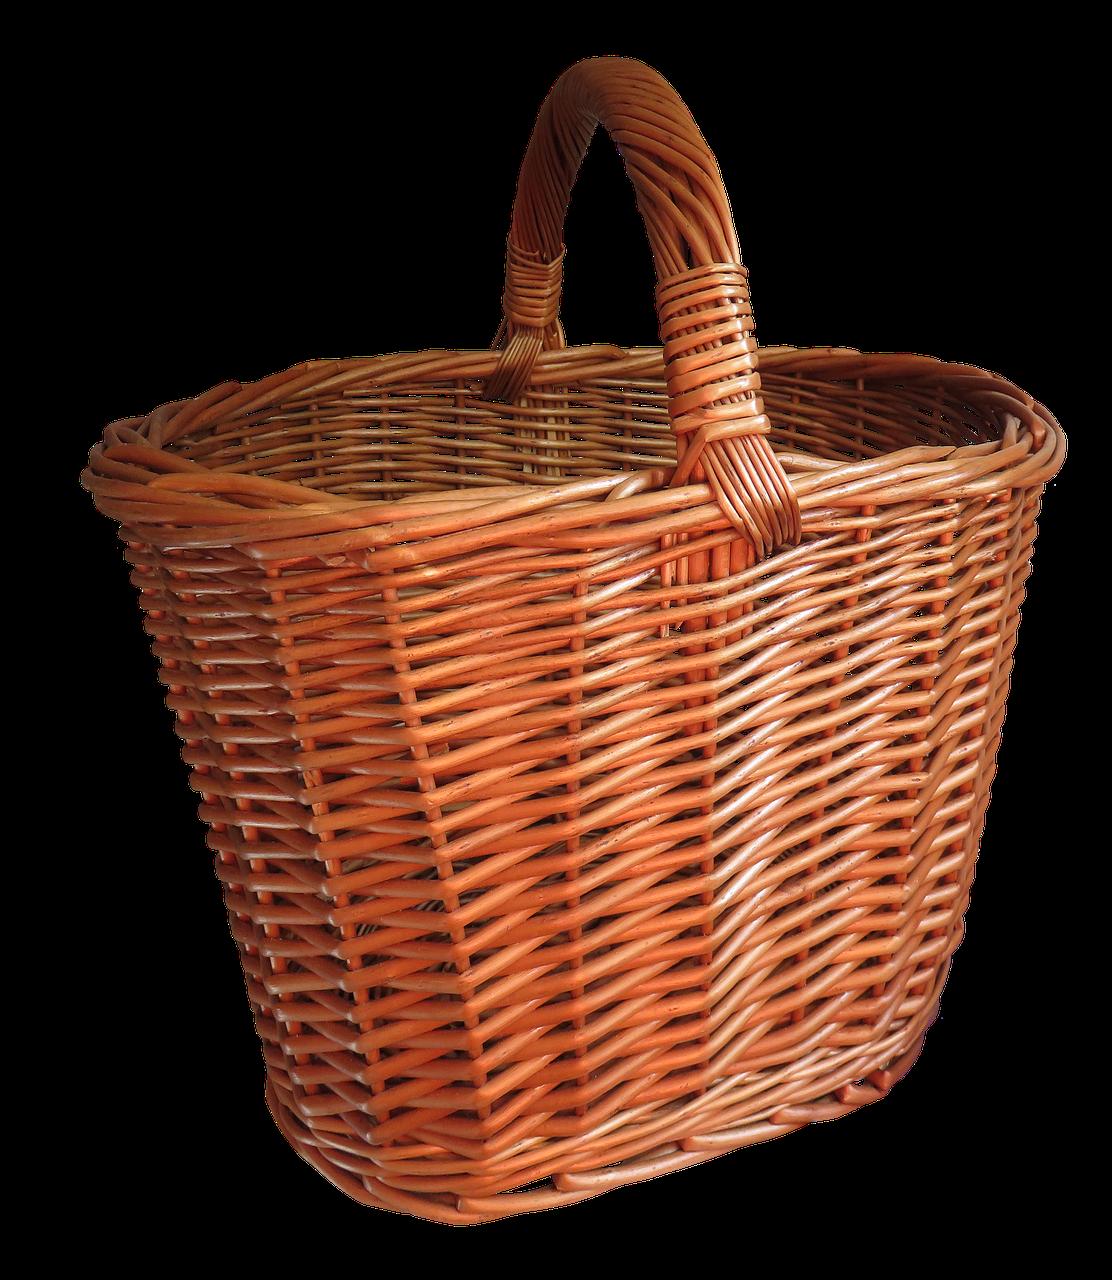 Wooden Basket, Basket, Keep, Object, Wood, HQ Photo